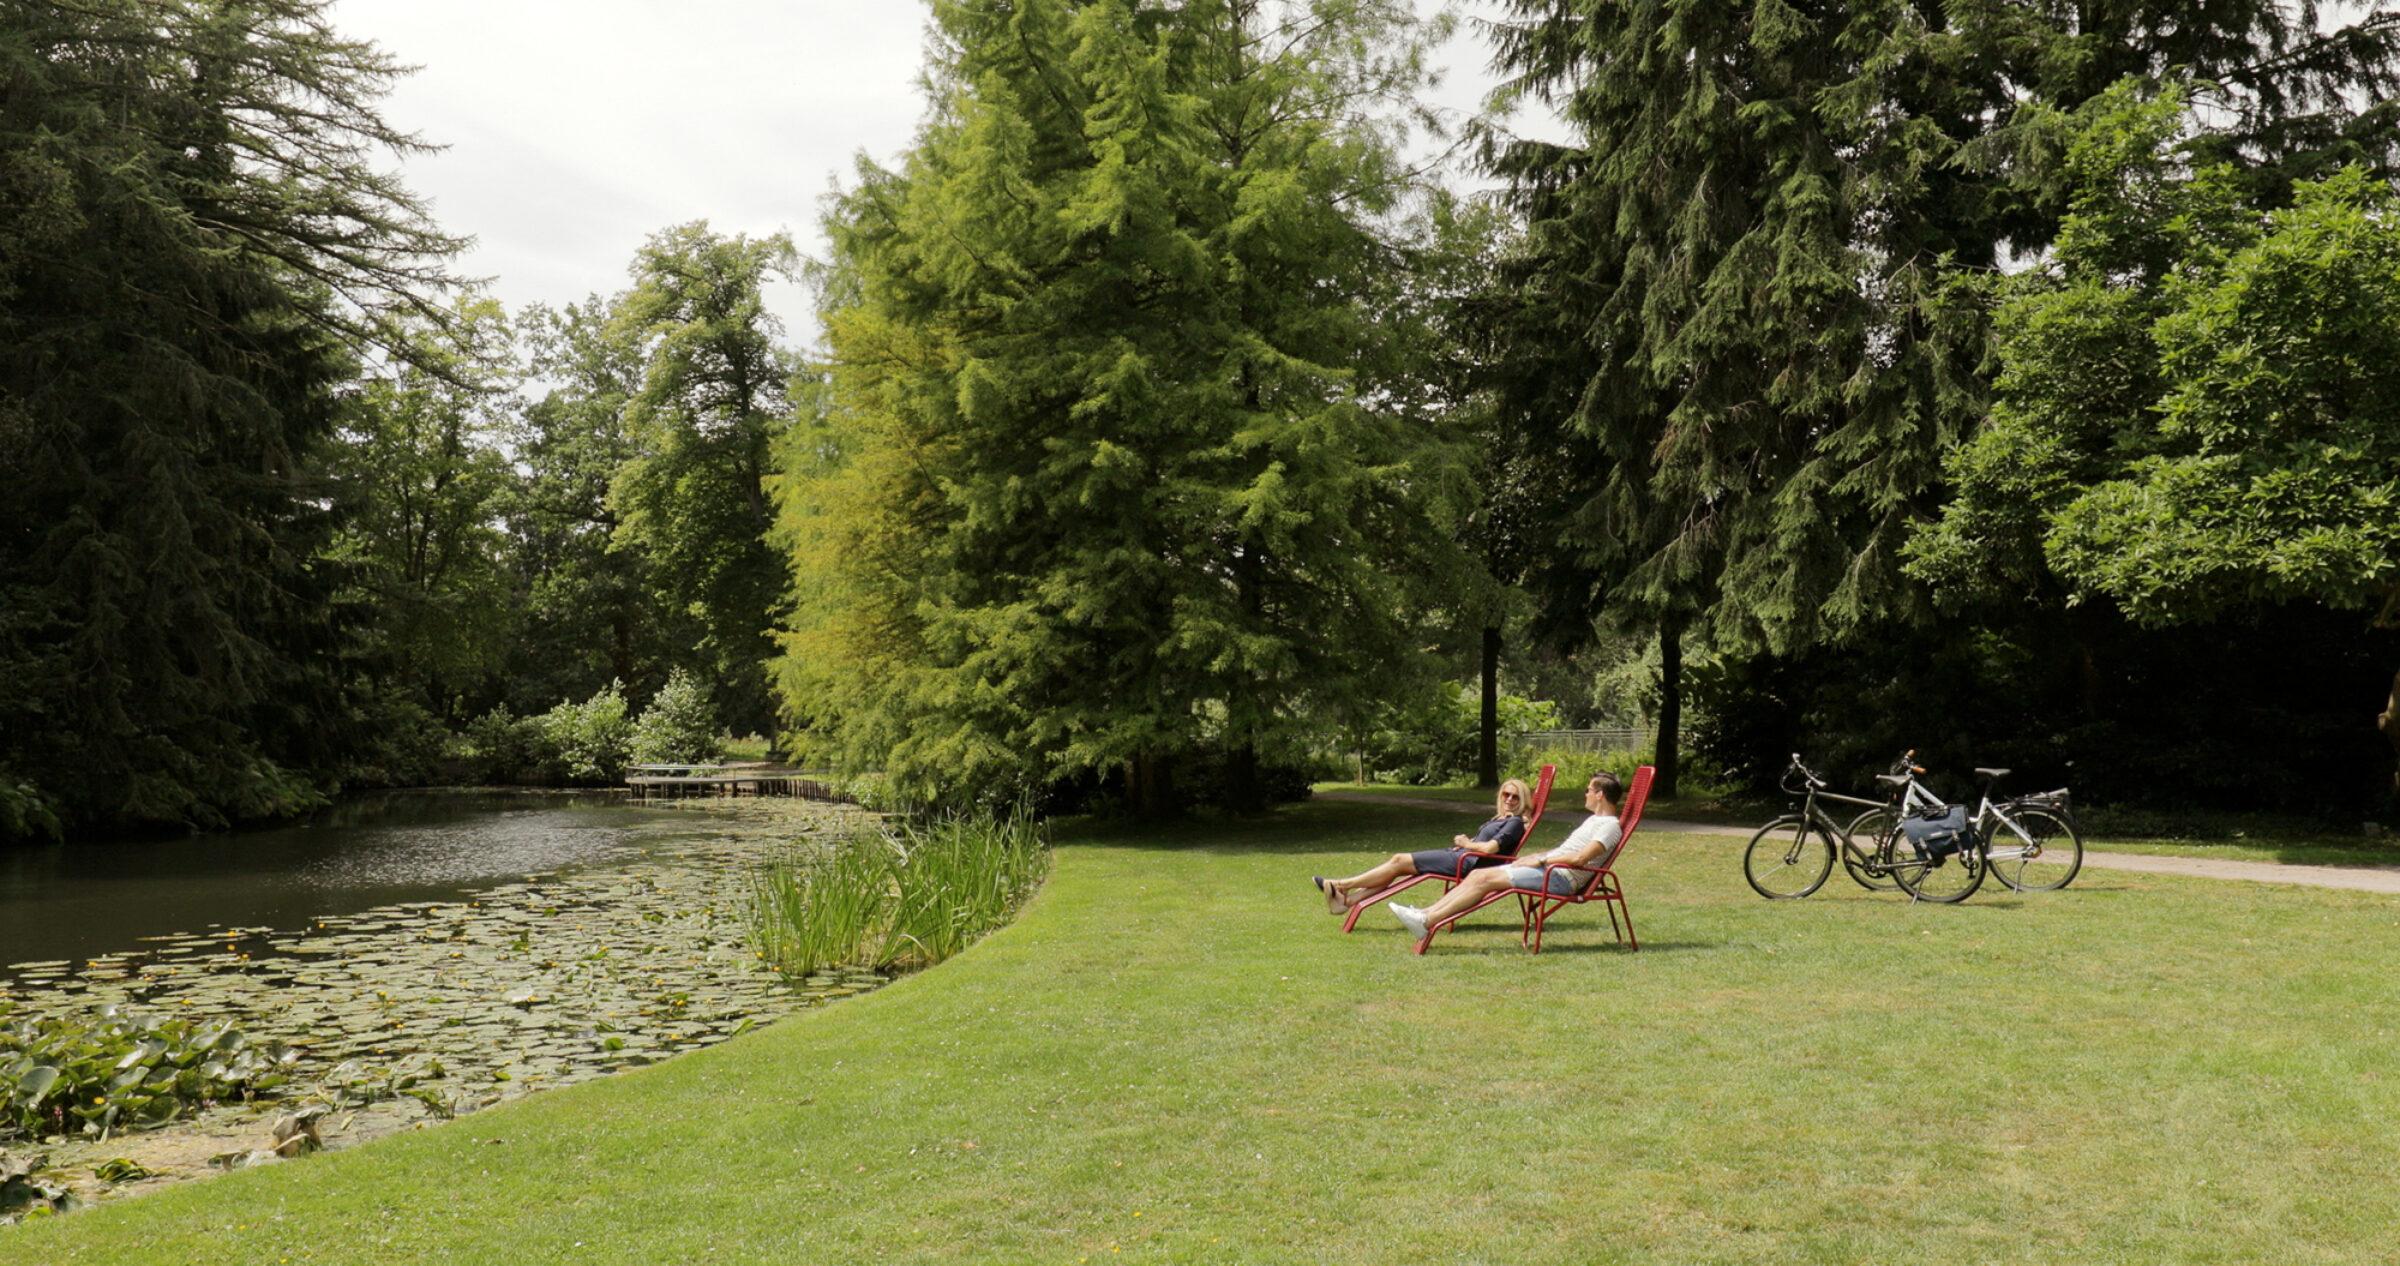 natur-und-parks-enschede